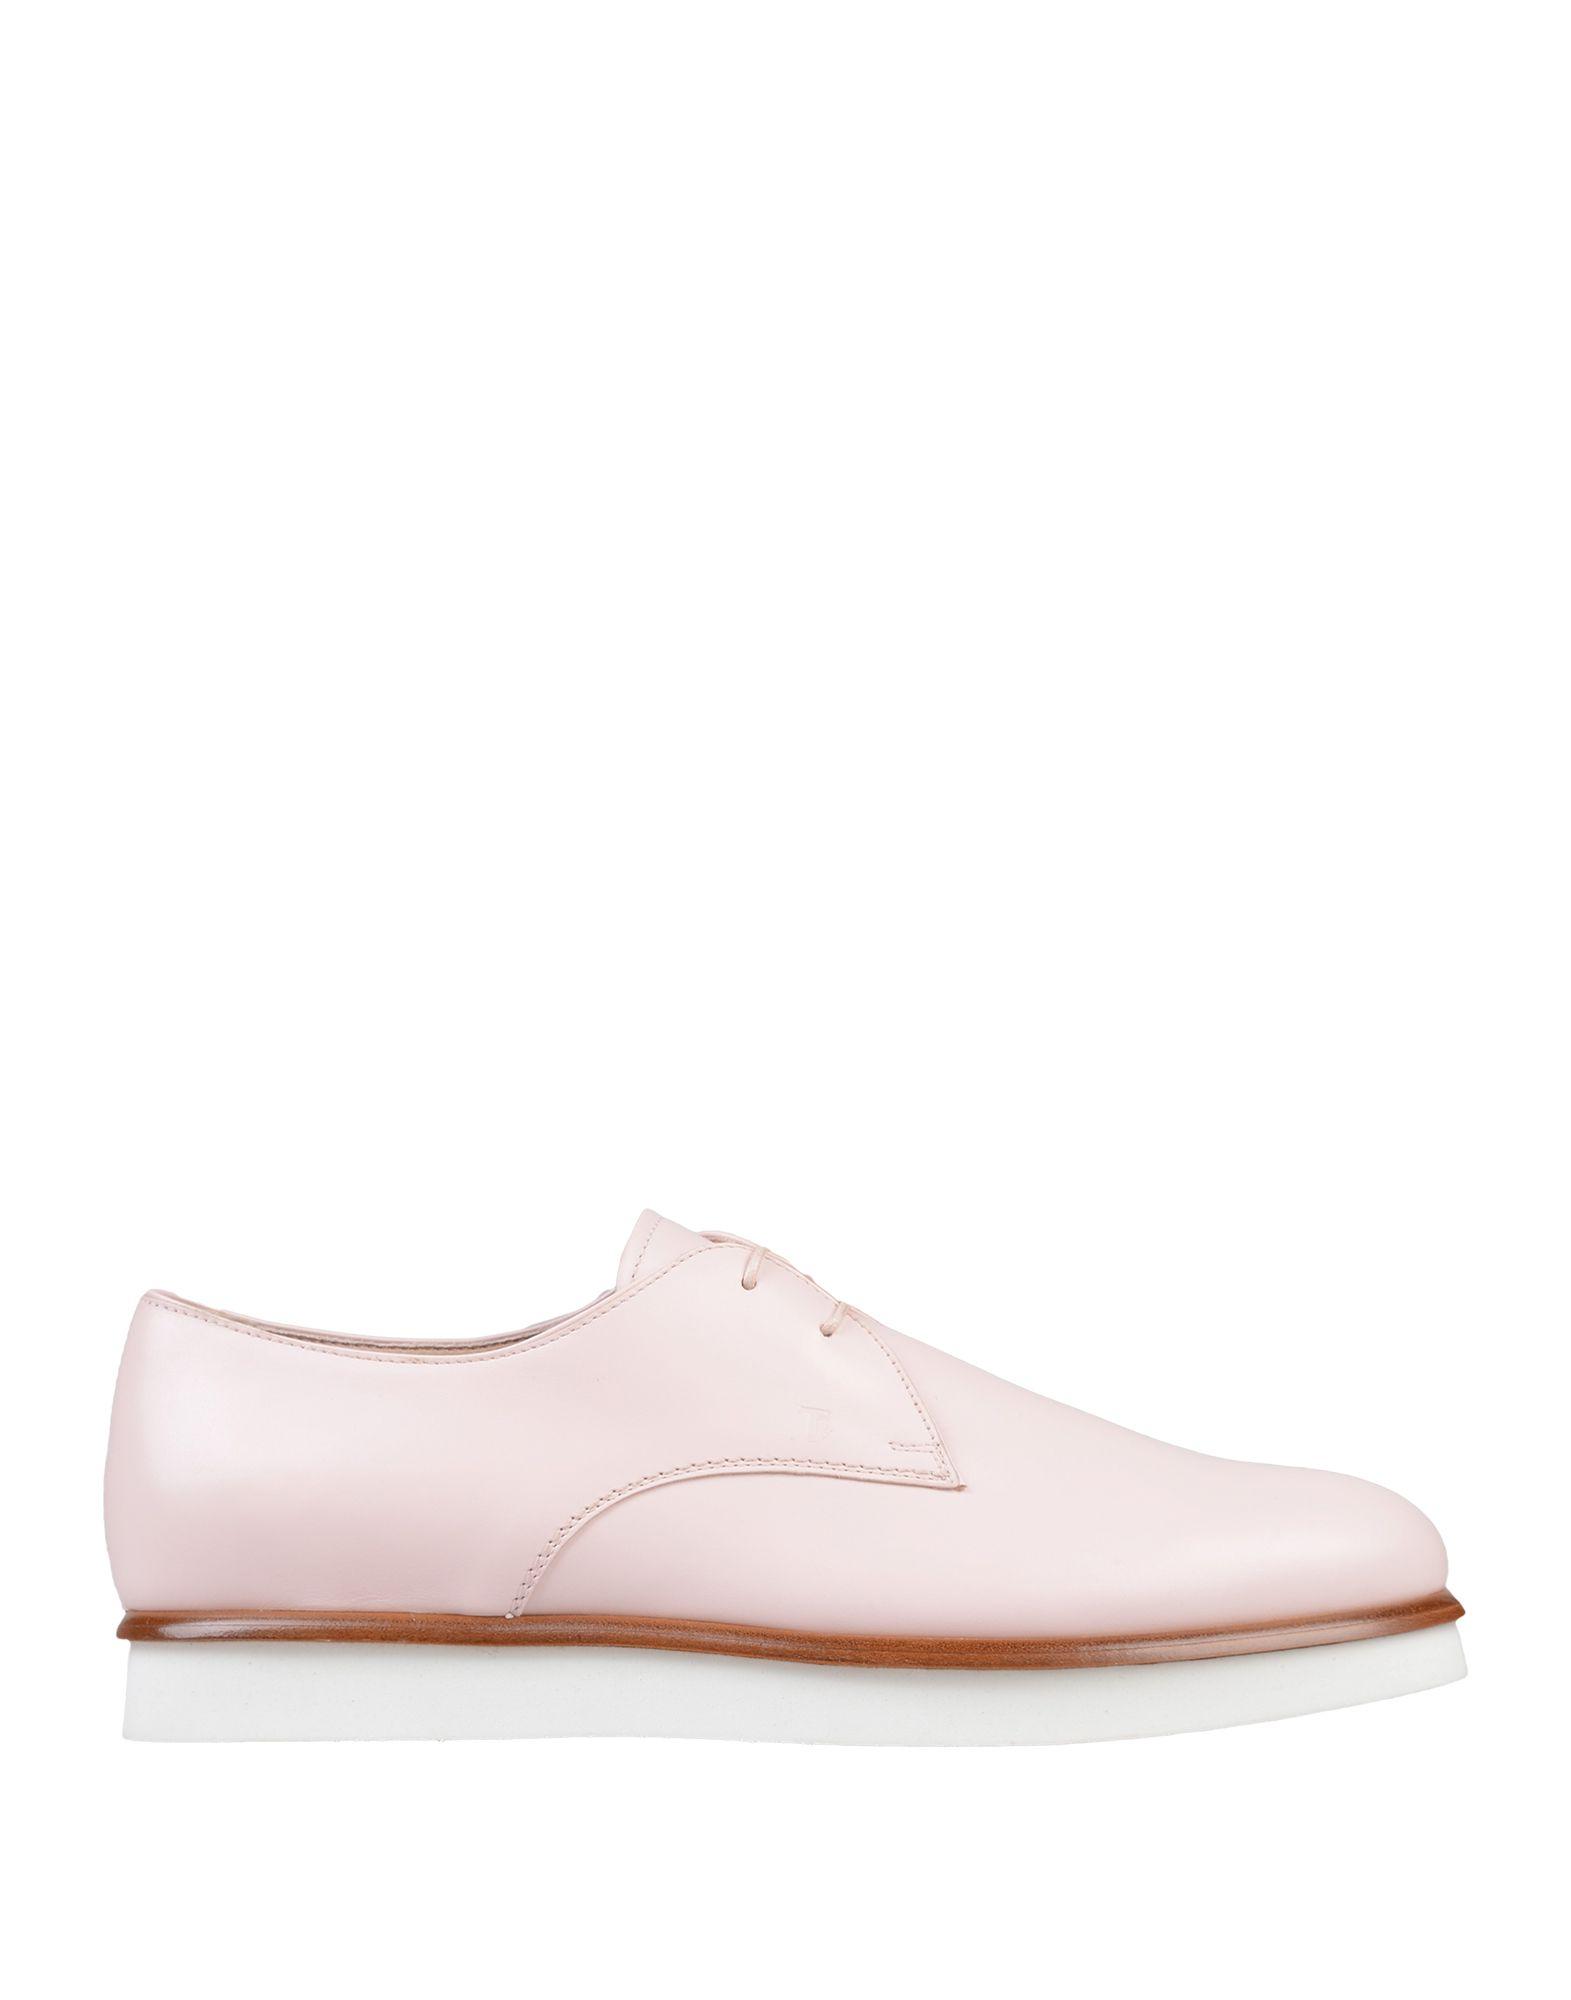 Фото - TOD'S Обувь на шнурках обувь на высокой платформе dkny